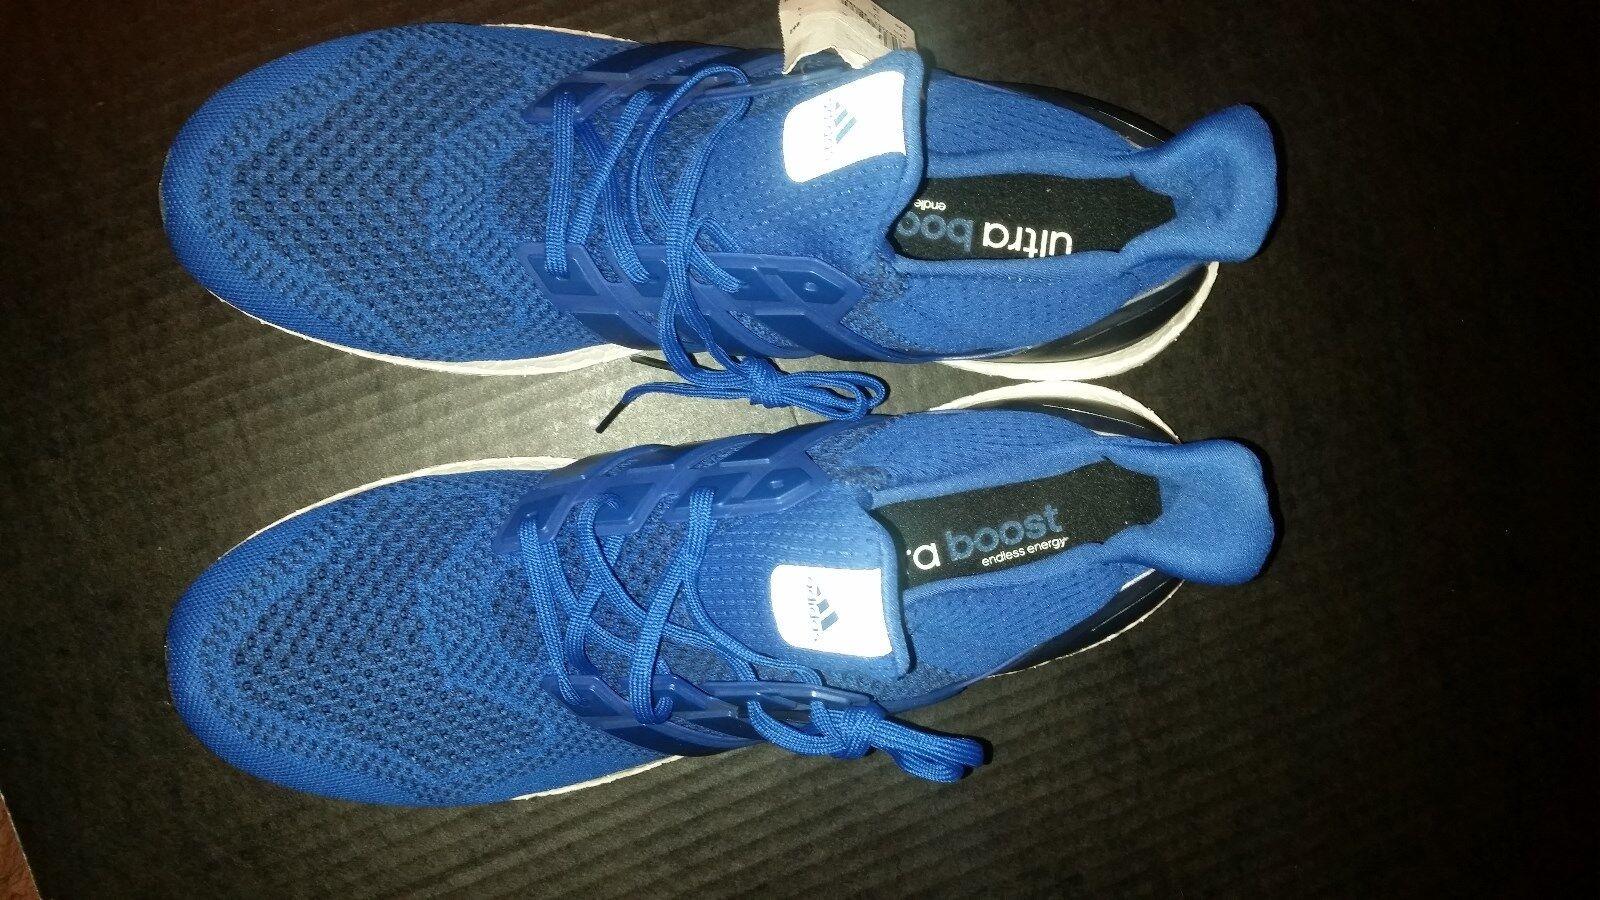 BRAND NEW Adidas Ultra Boost 1.0 Royal Blue DEADSTOCK rare jordan kd grails